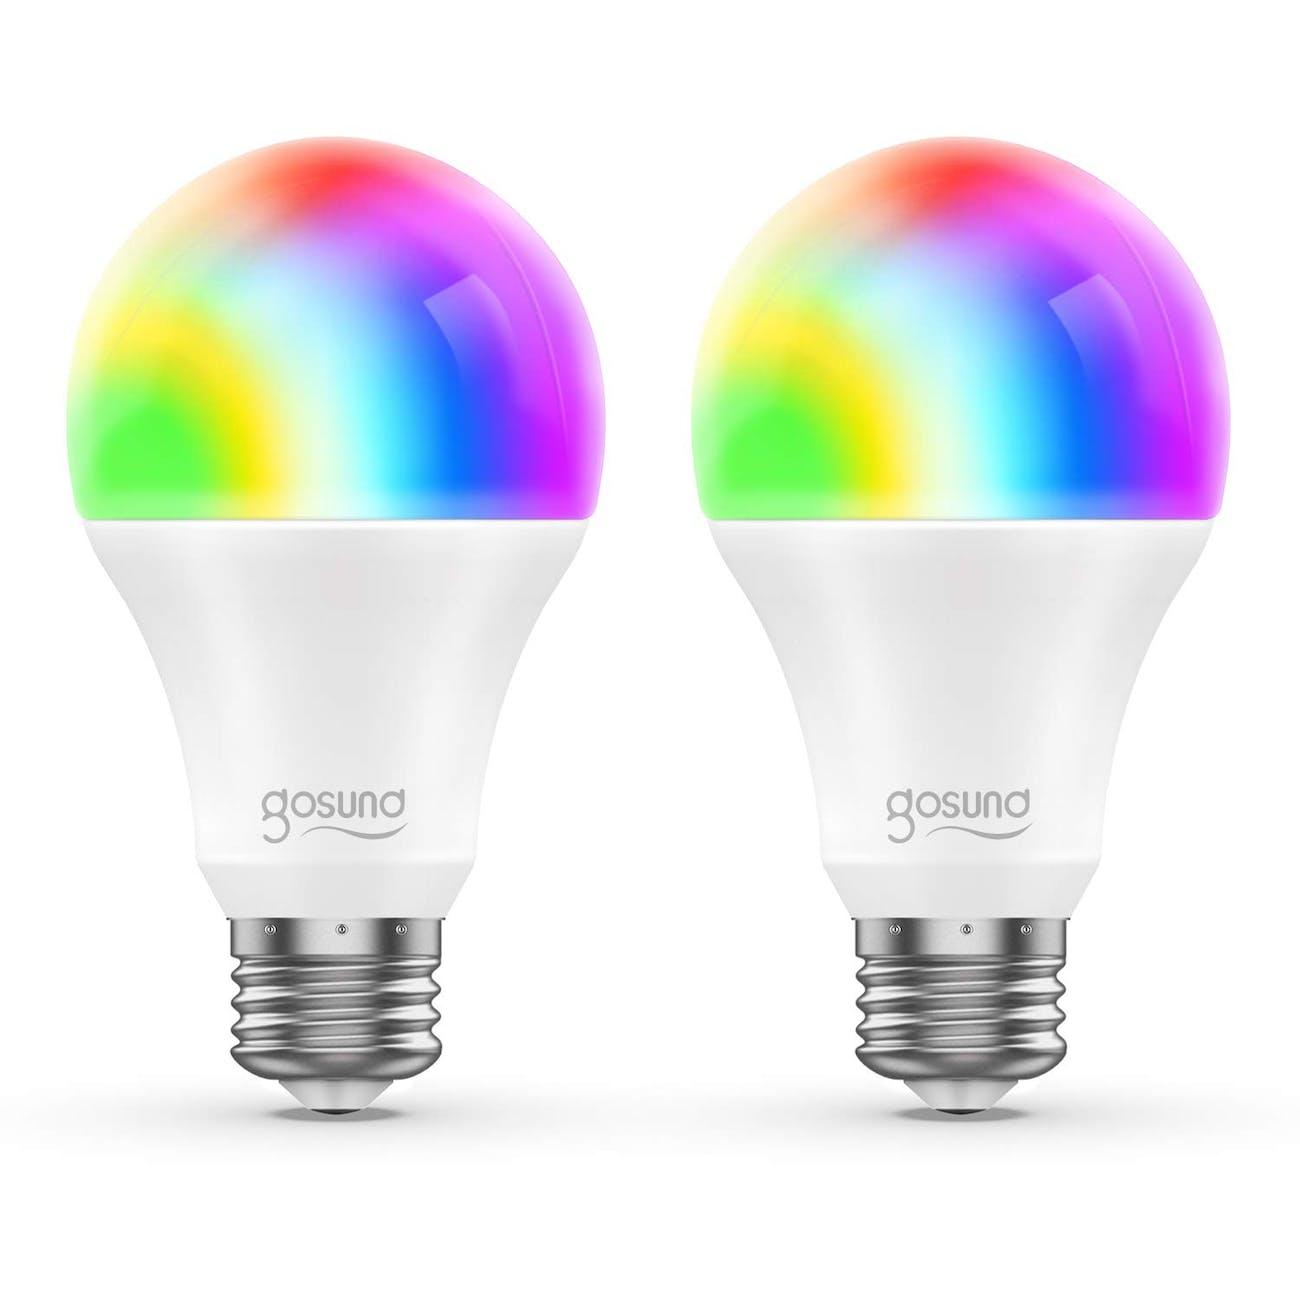 Gosuno Smart WiFi LED Light Bulb